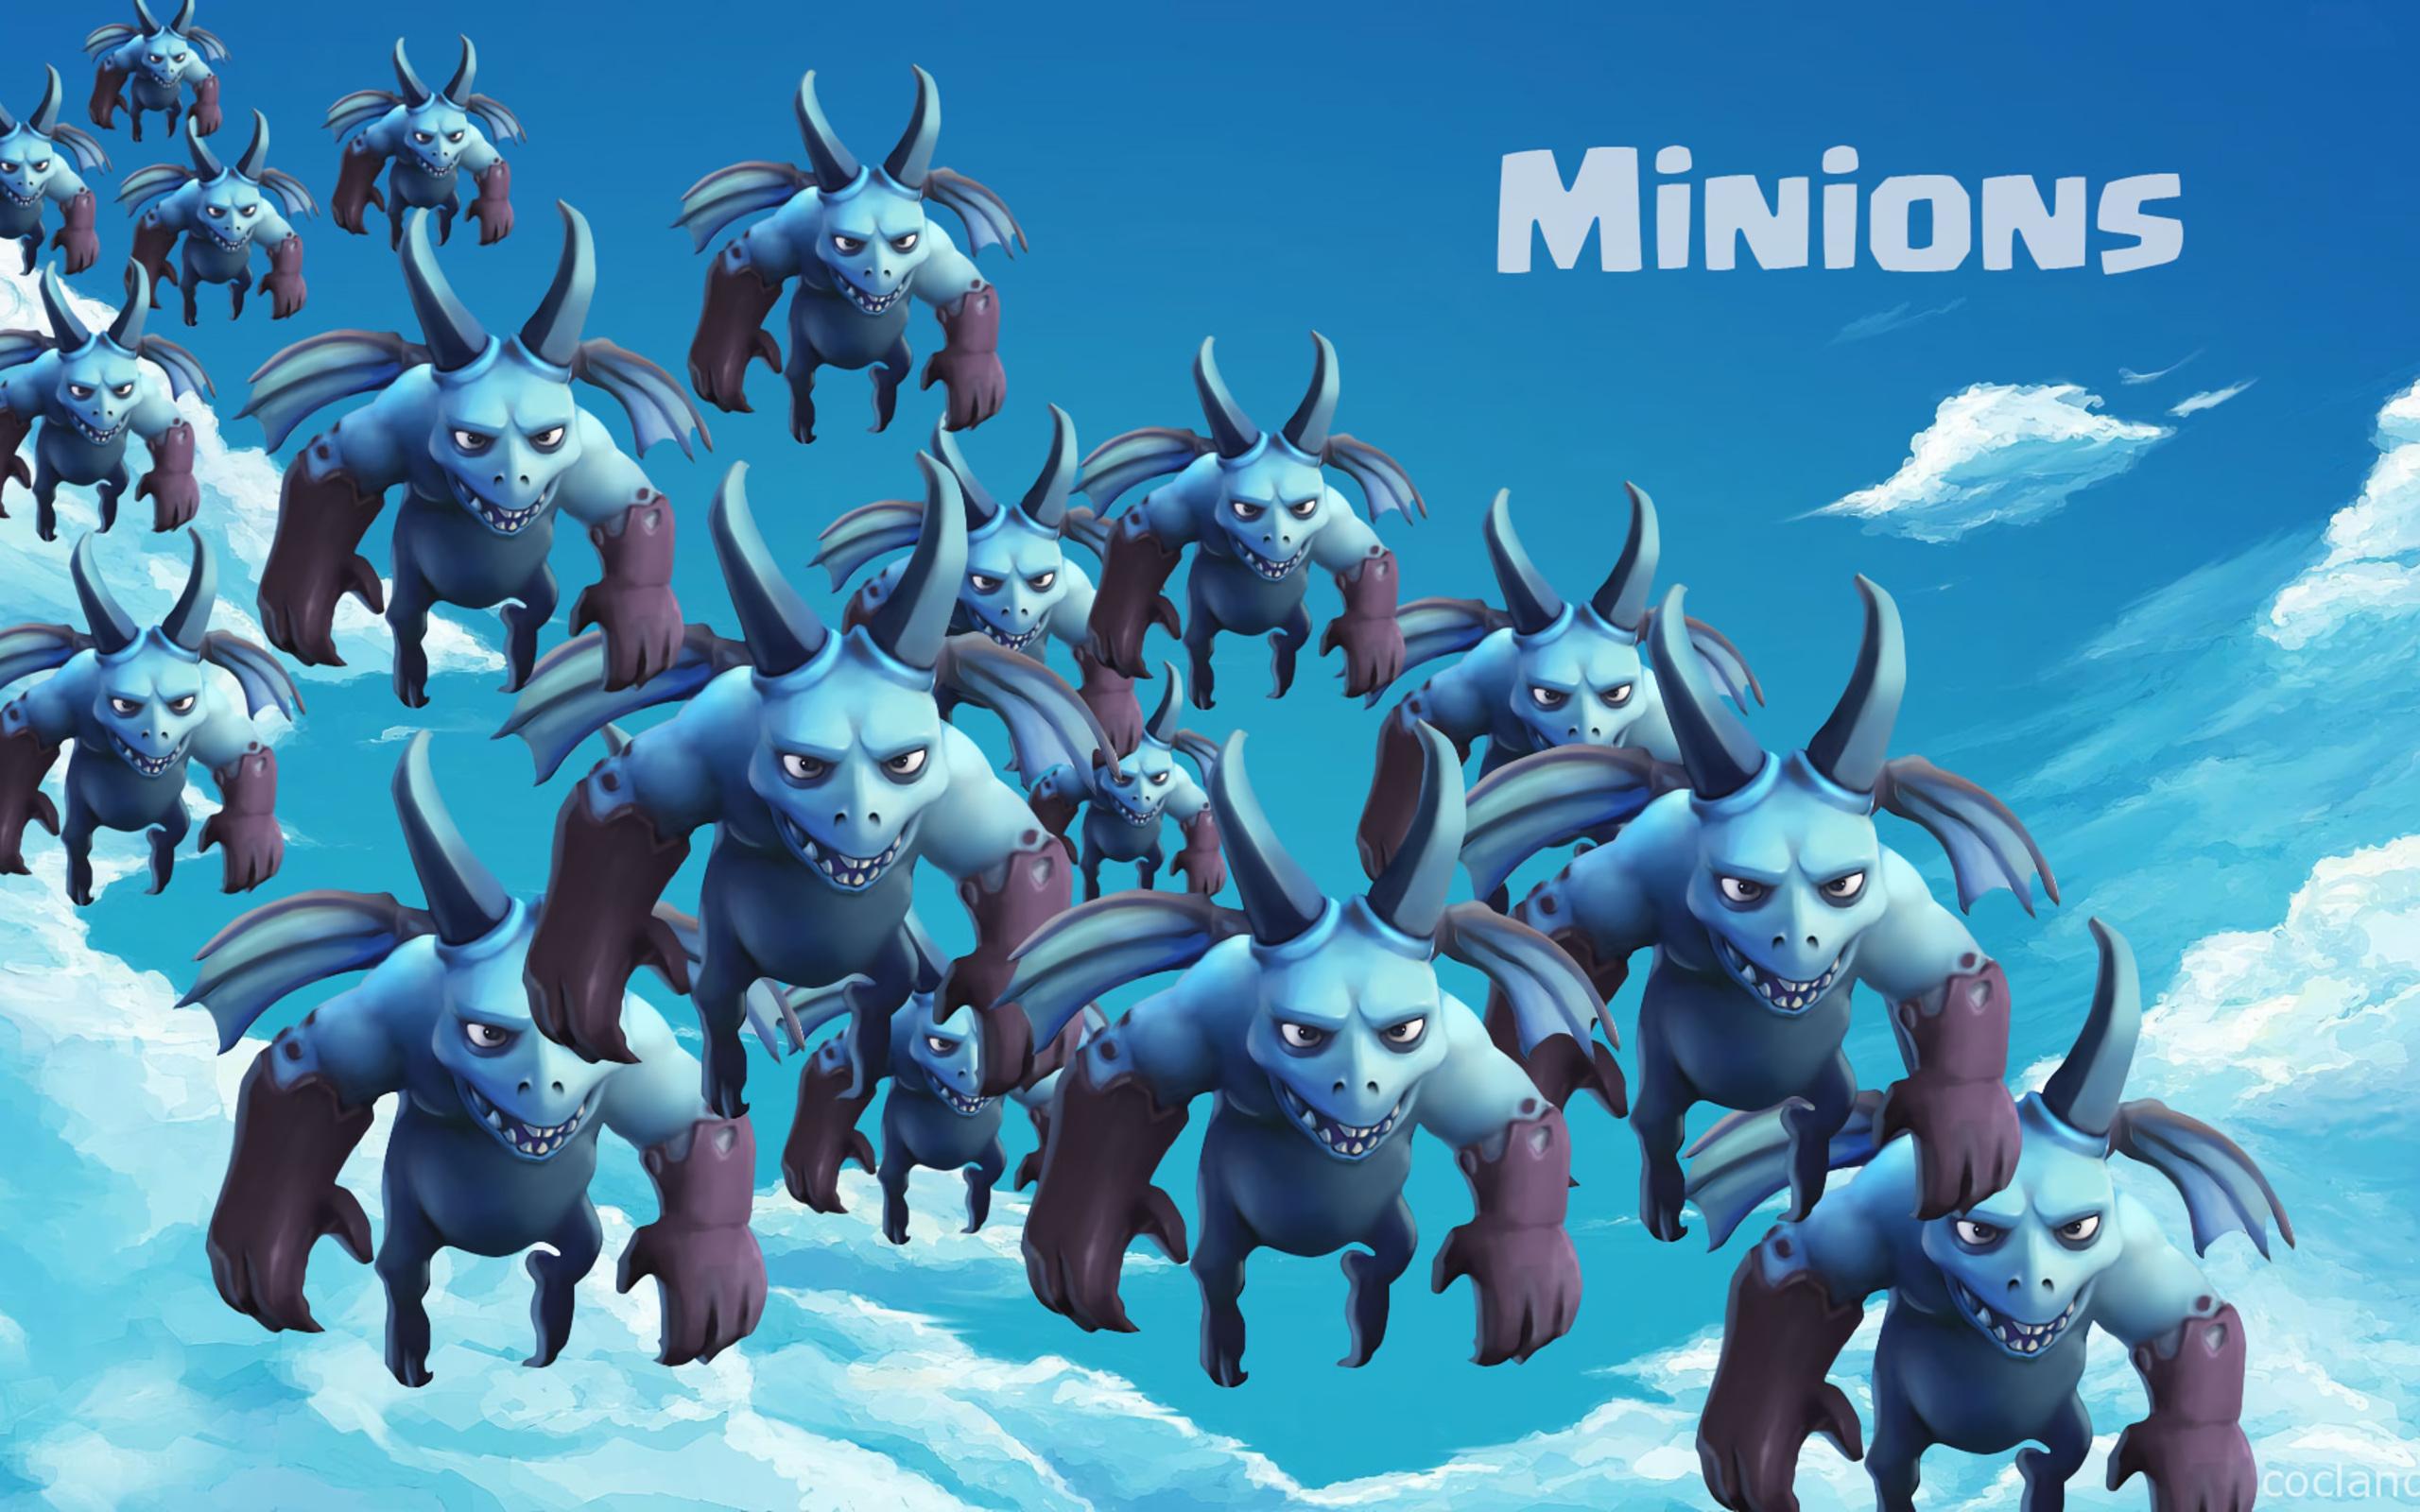 minions-clash-of-clans-po.jpg